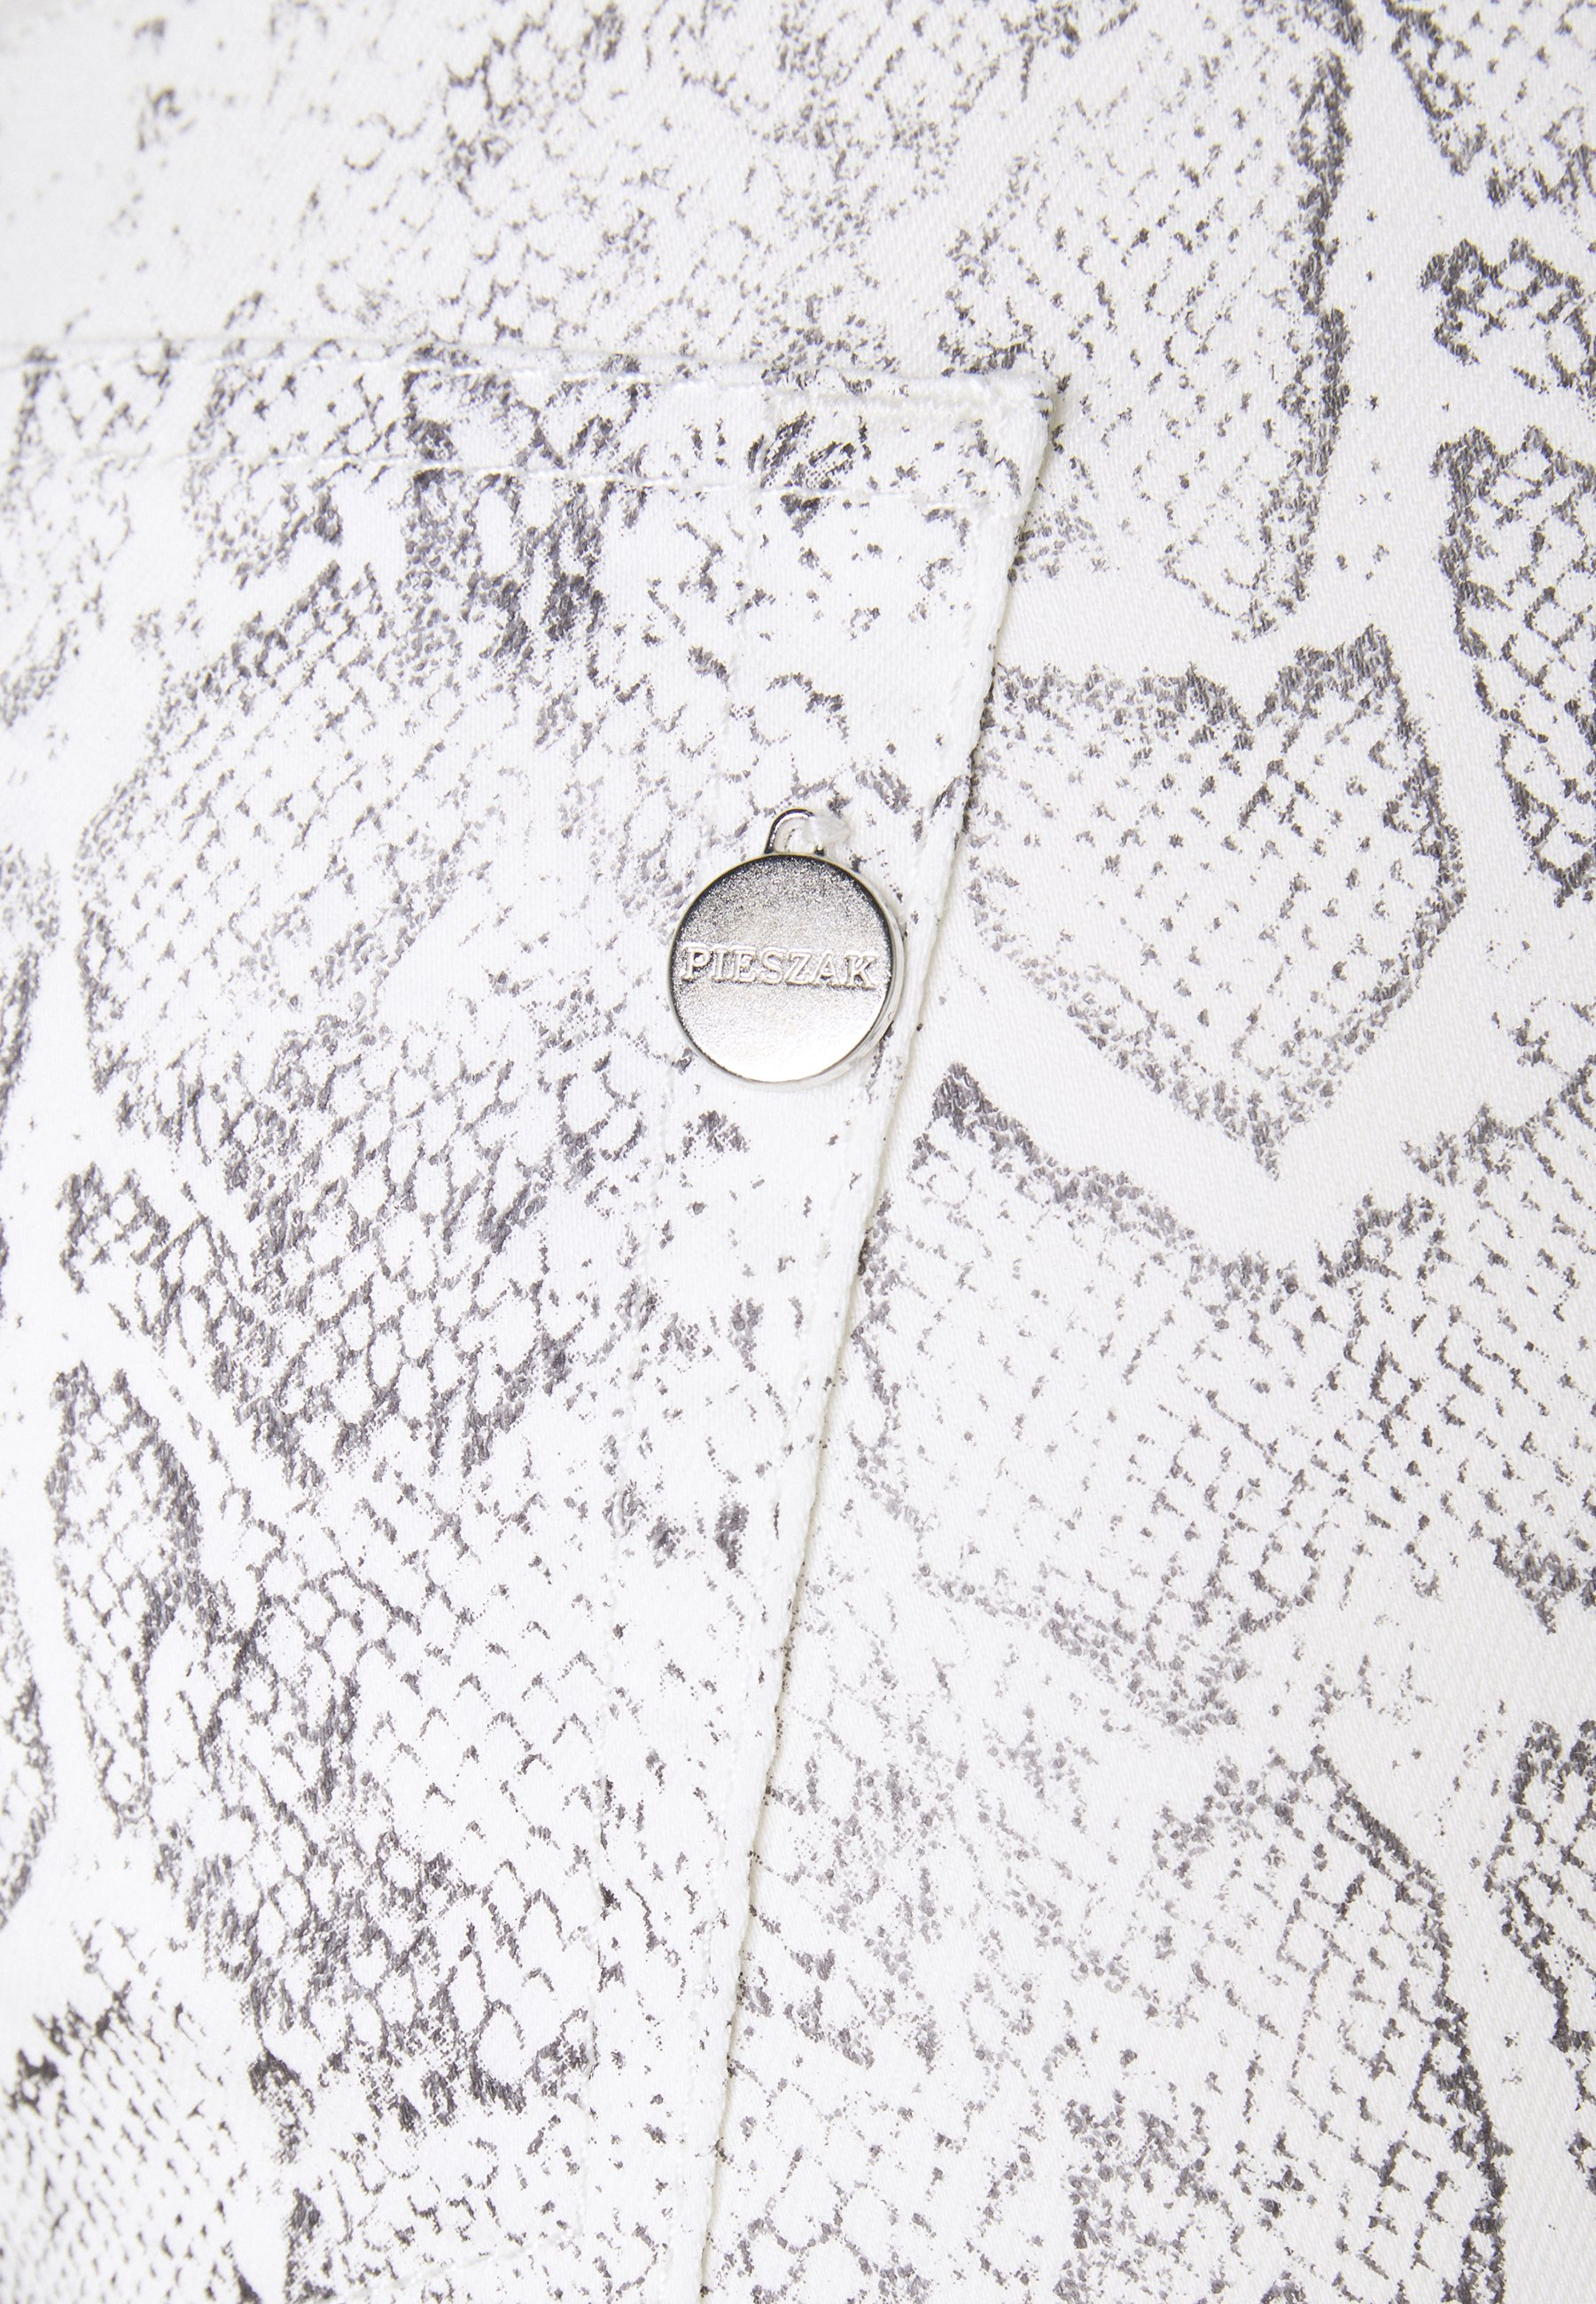 Big Discount Women's Clothing Pieszak POLINE ANKLE SNAKE Trousers white / grey 1XbhqPY7B